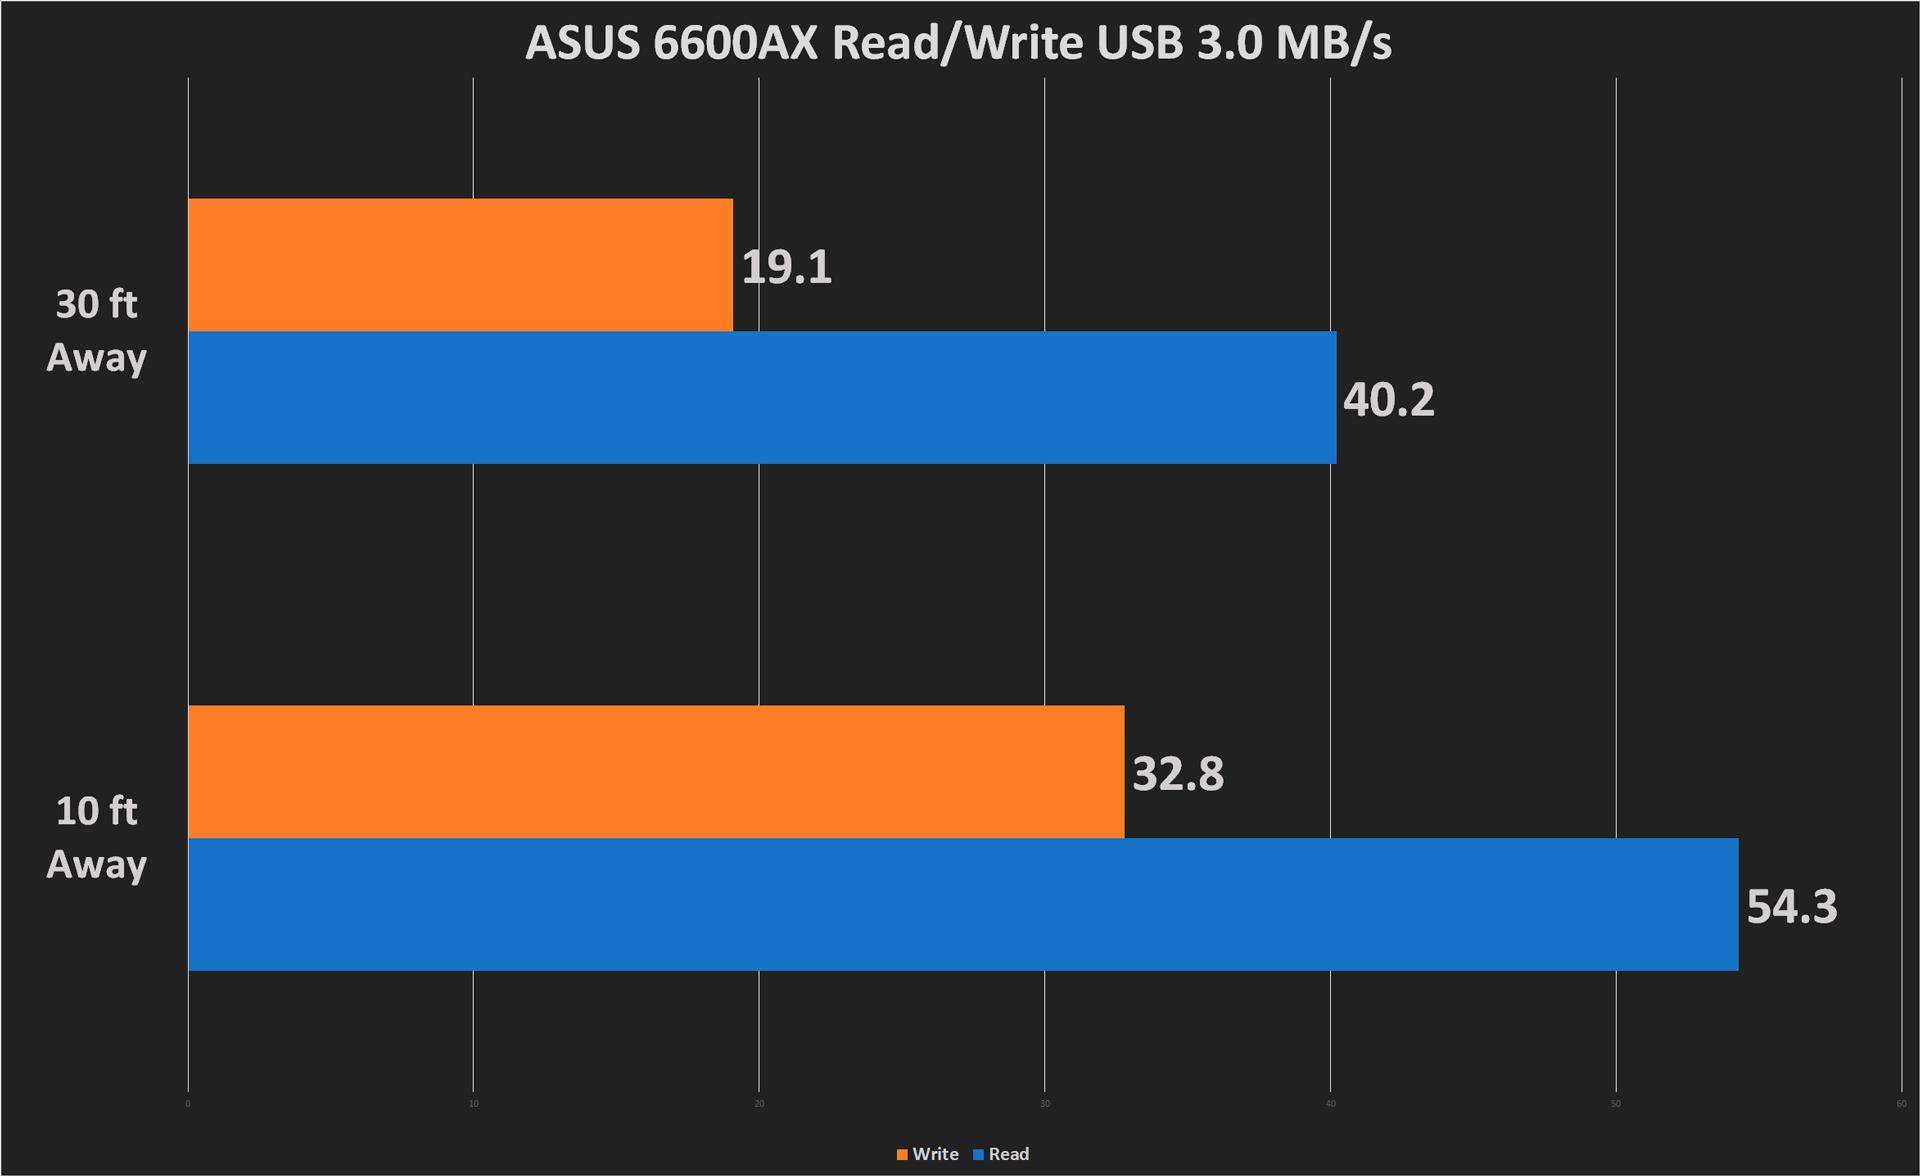 USB Performance